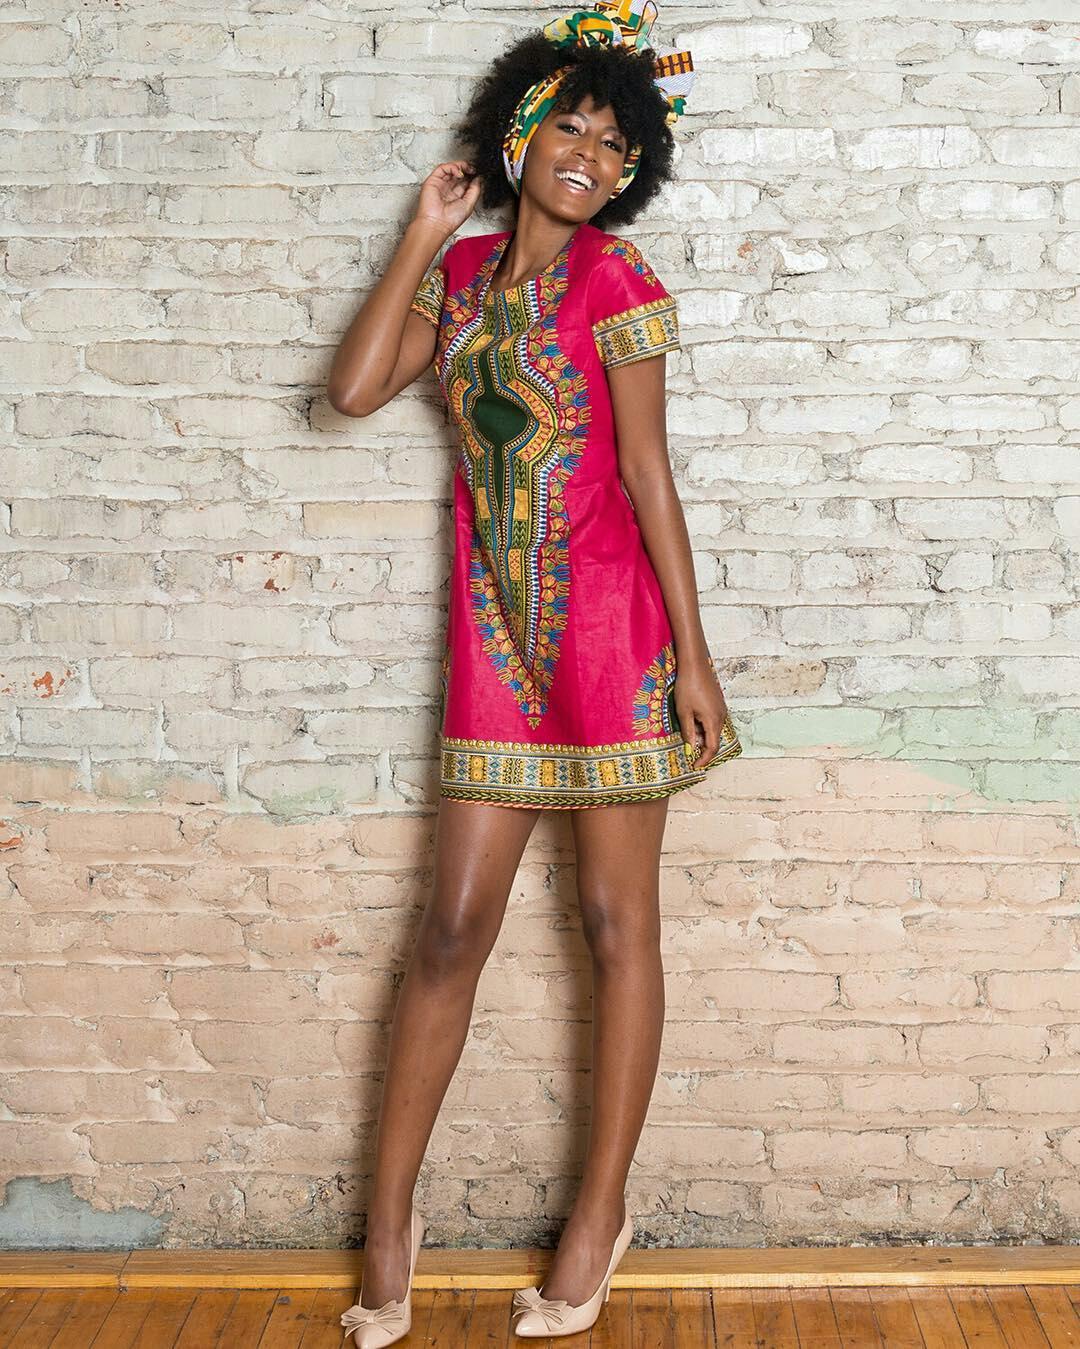 Dressing des 4 Saisons Concours Tunique Dashiki Giveaway Robe Trapèze Dress pink rose Zuvaa